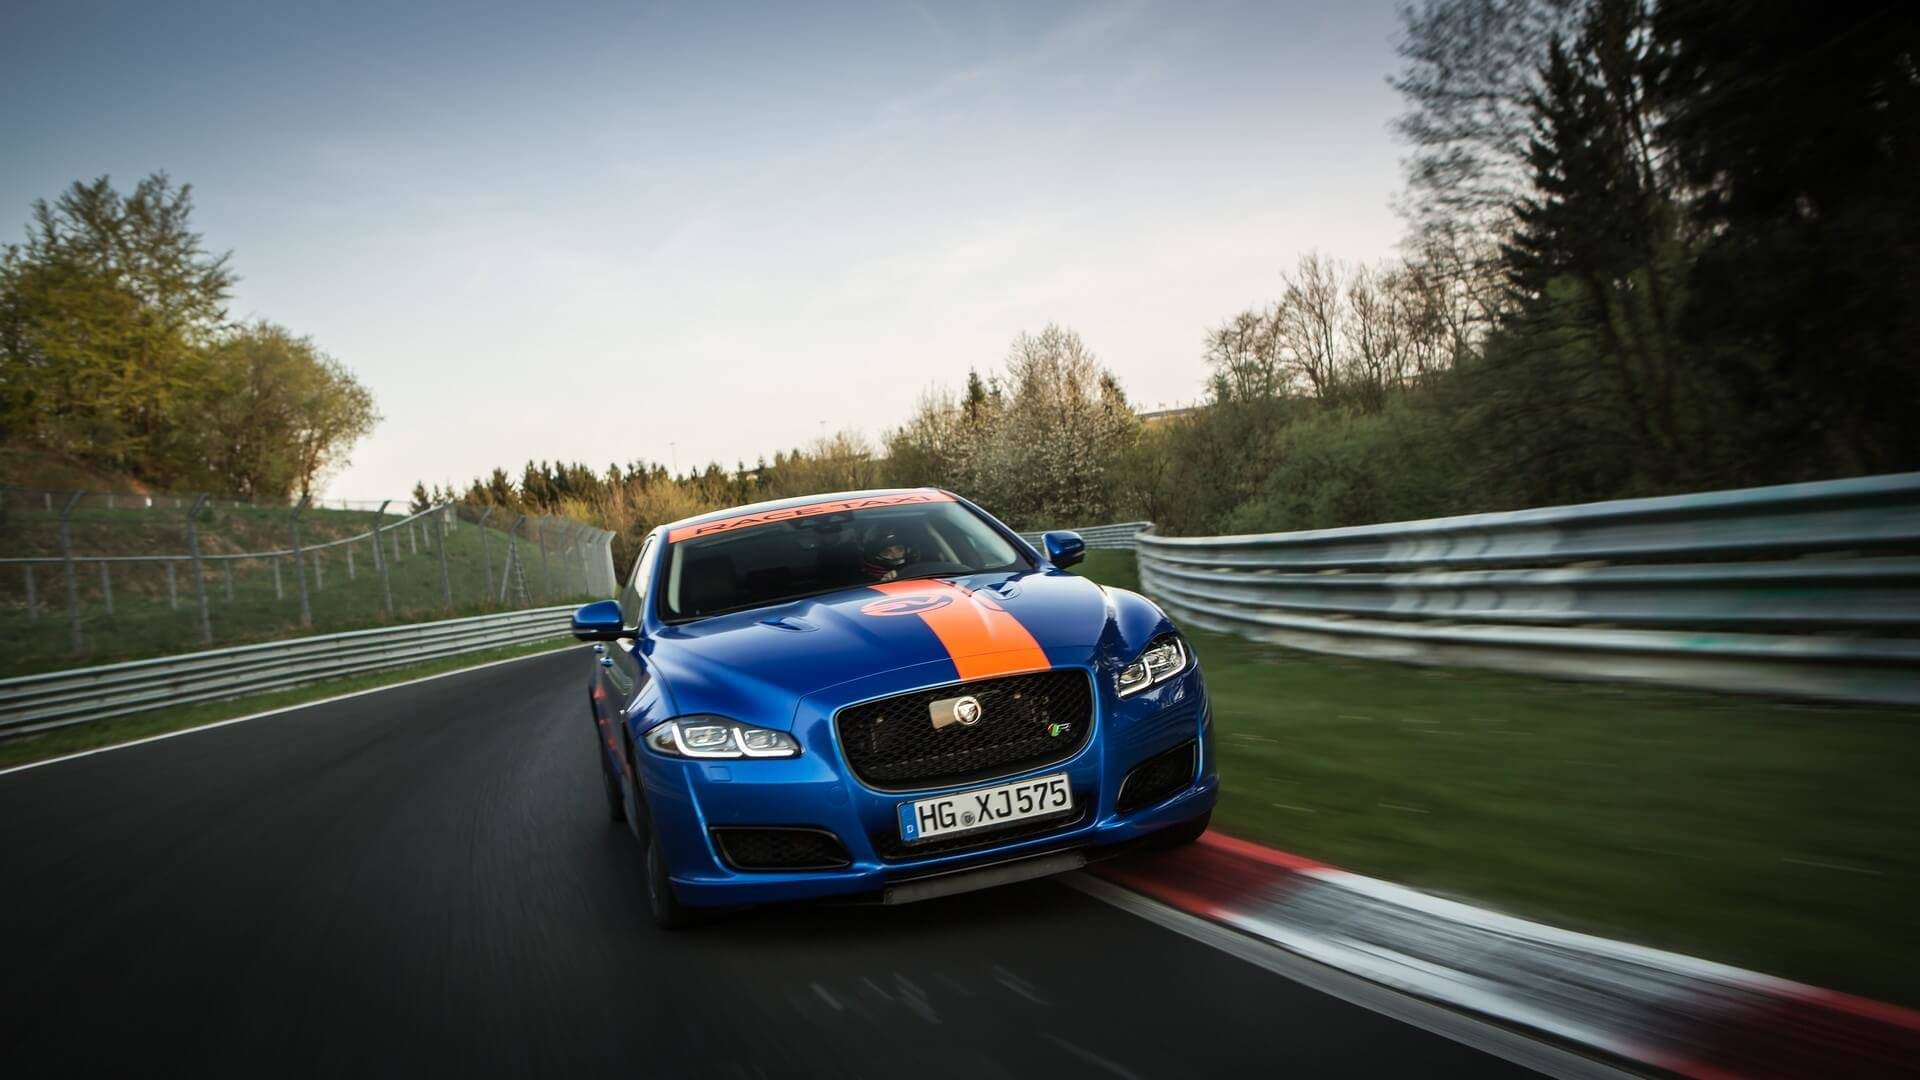 Jaguar_Nurburgring_taxi_0003